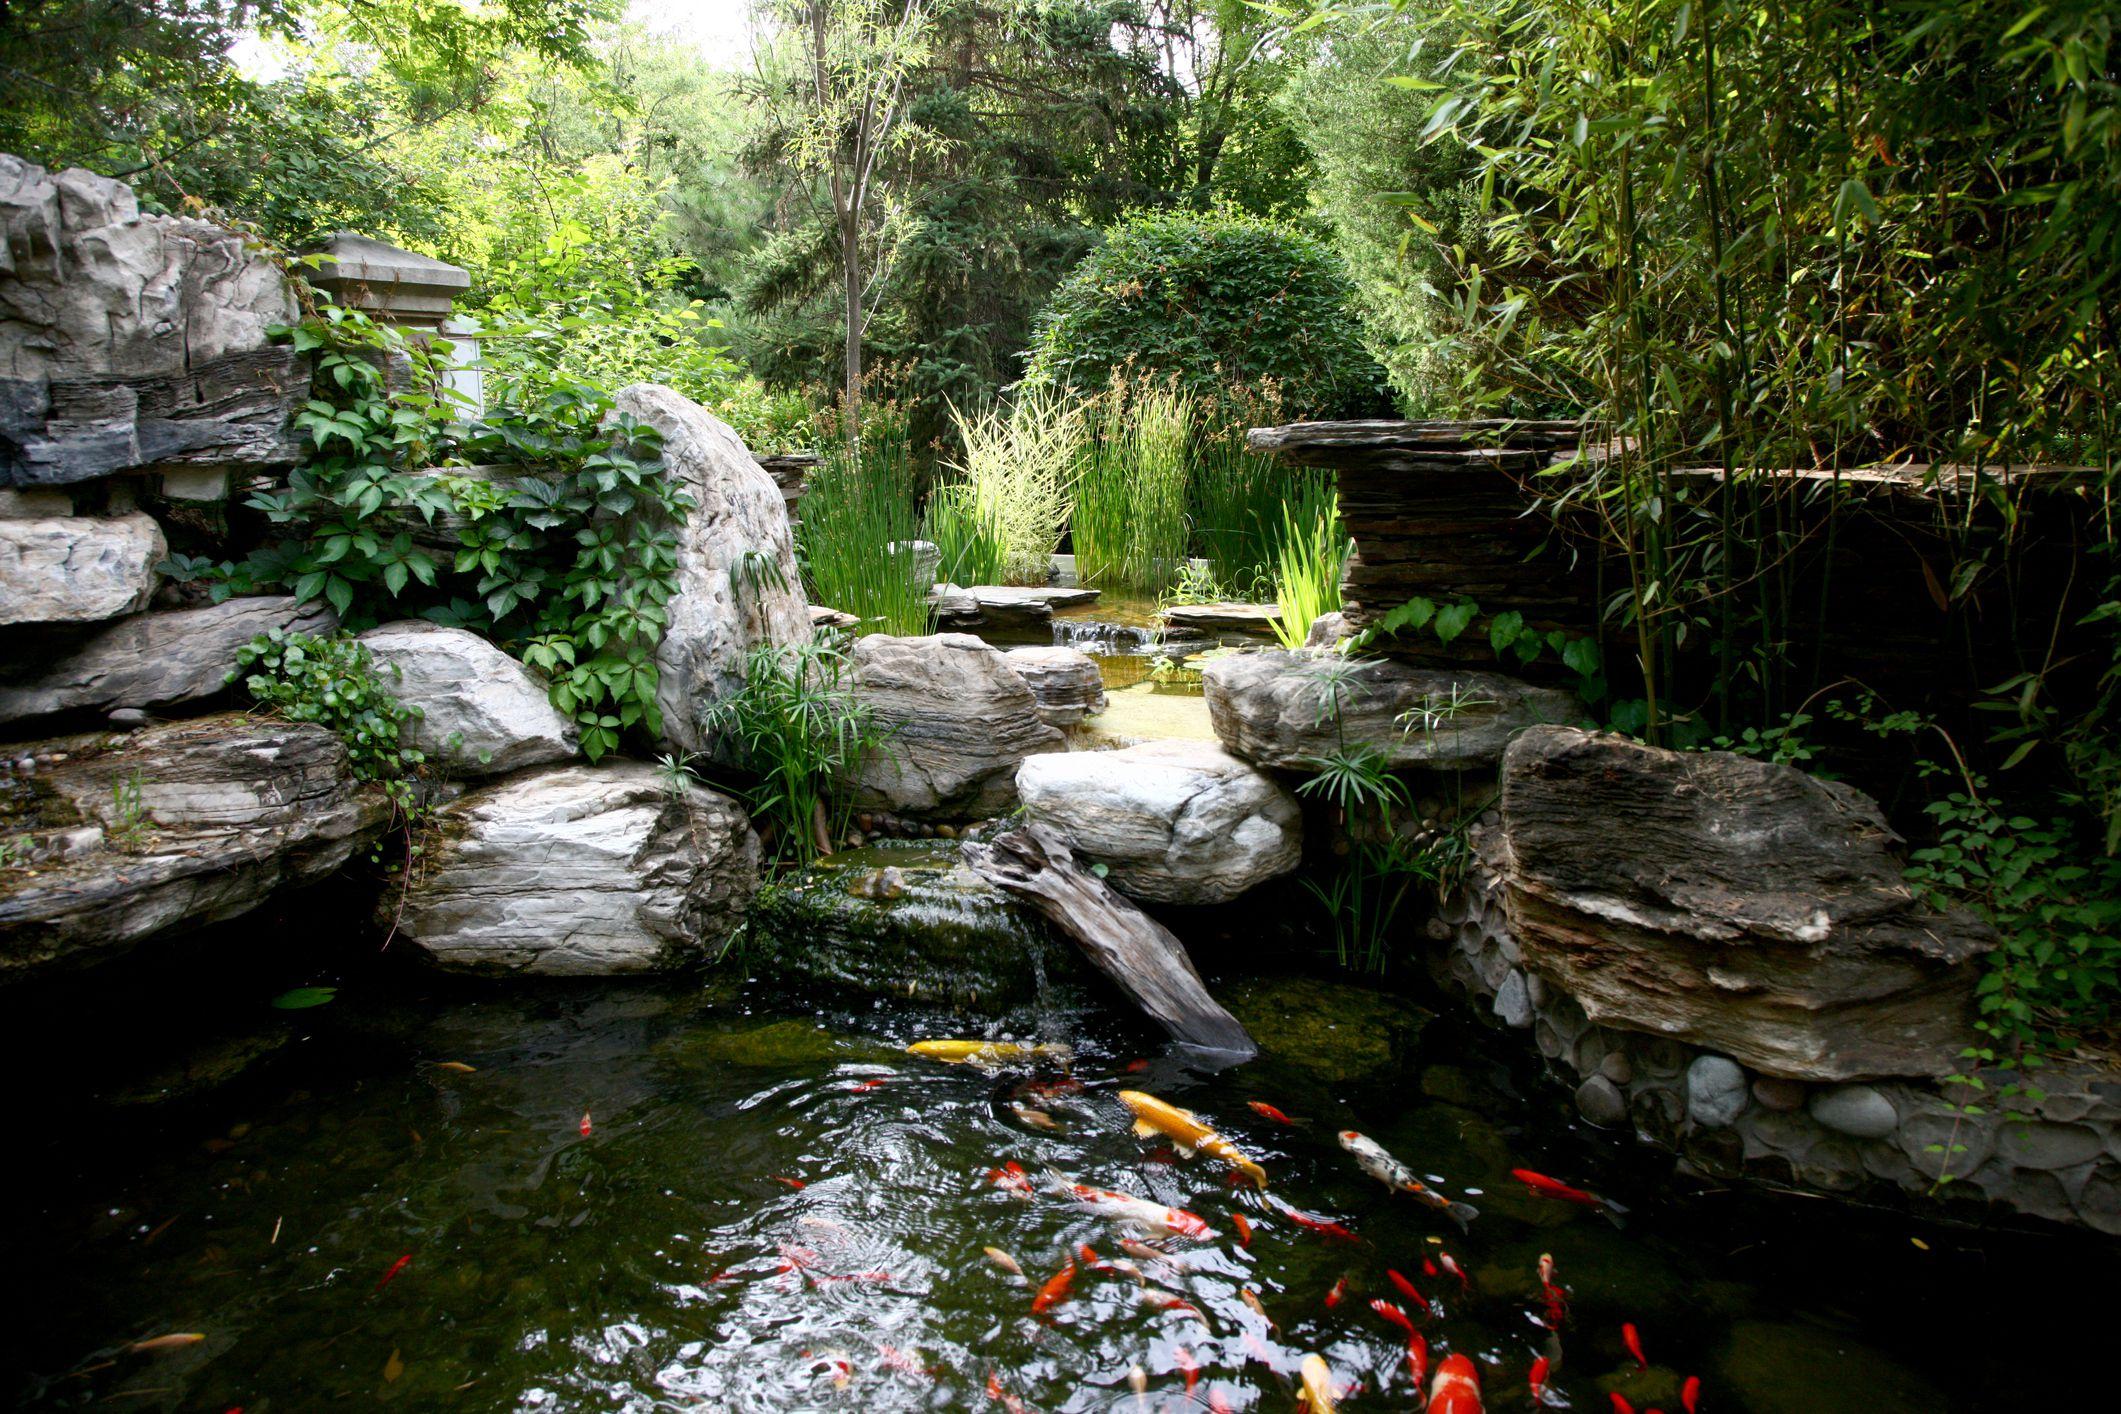 Aquarium Fish For Outdoor Fountains And Ponds